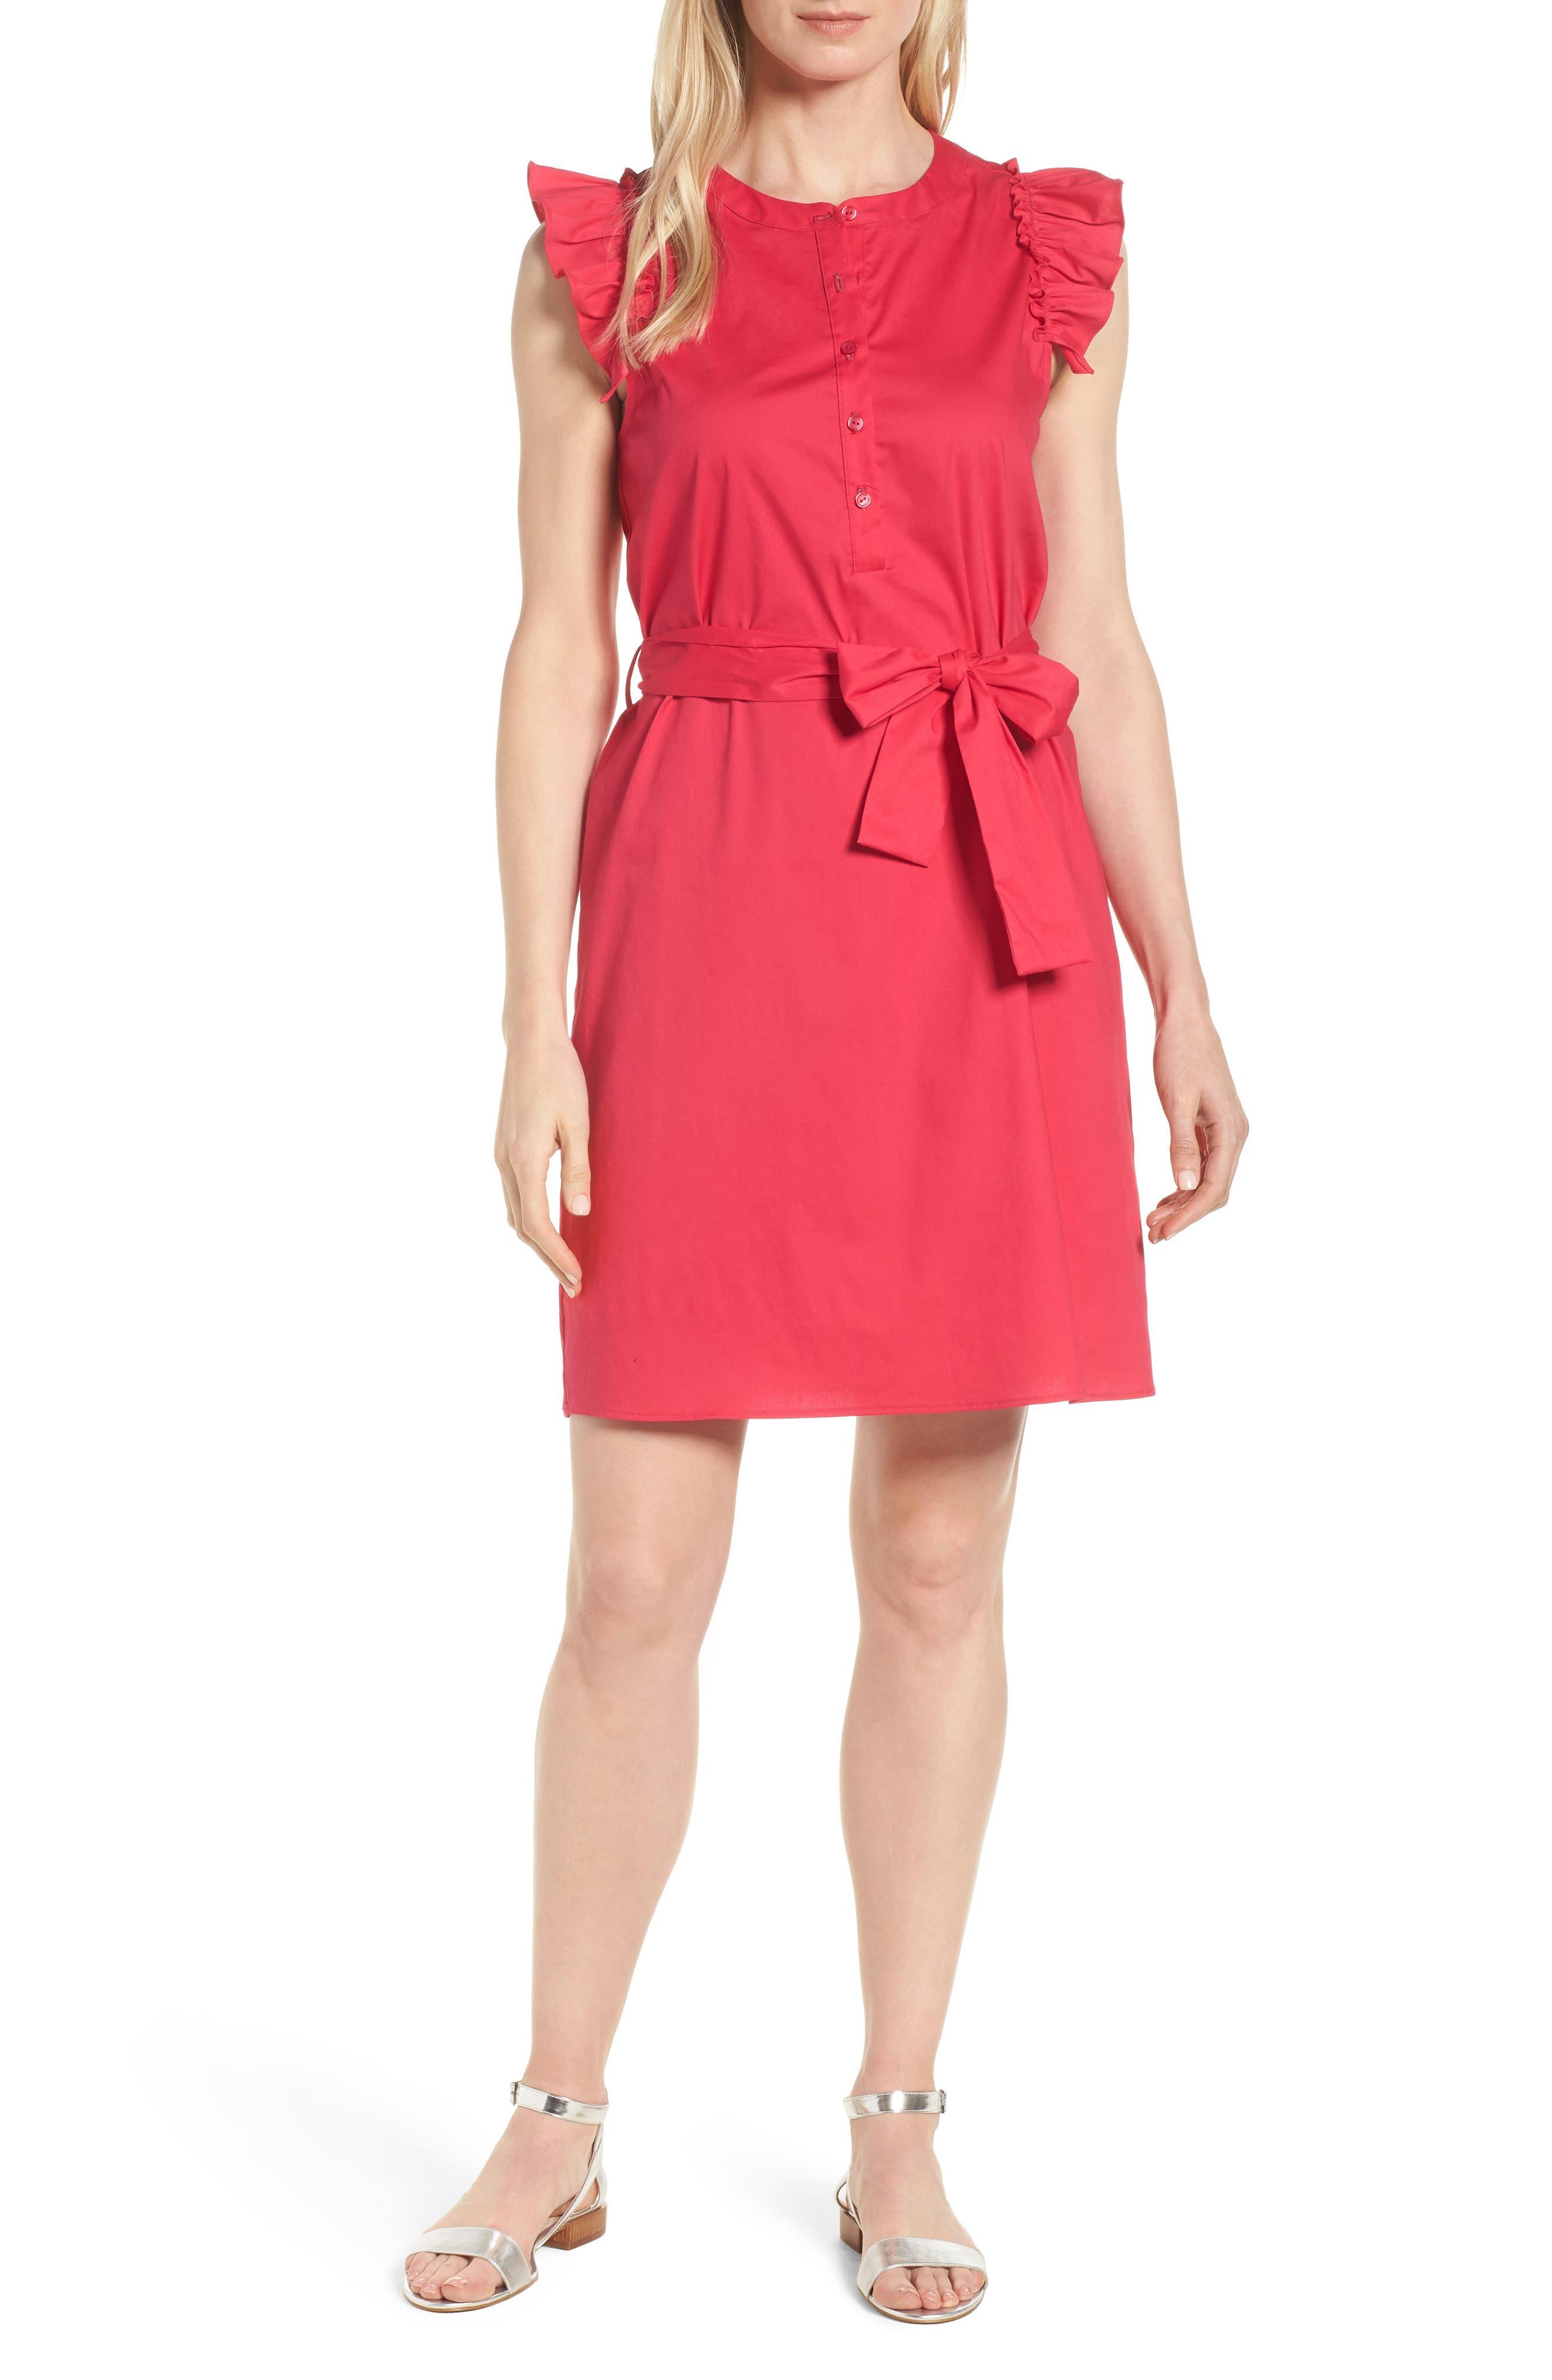 x Hi Sugarplum! Flamenco Ruffle Trim Dress,                         Main,                         color, Hot Pink